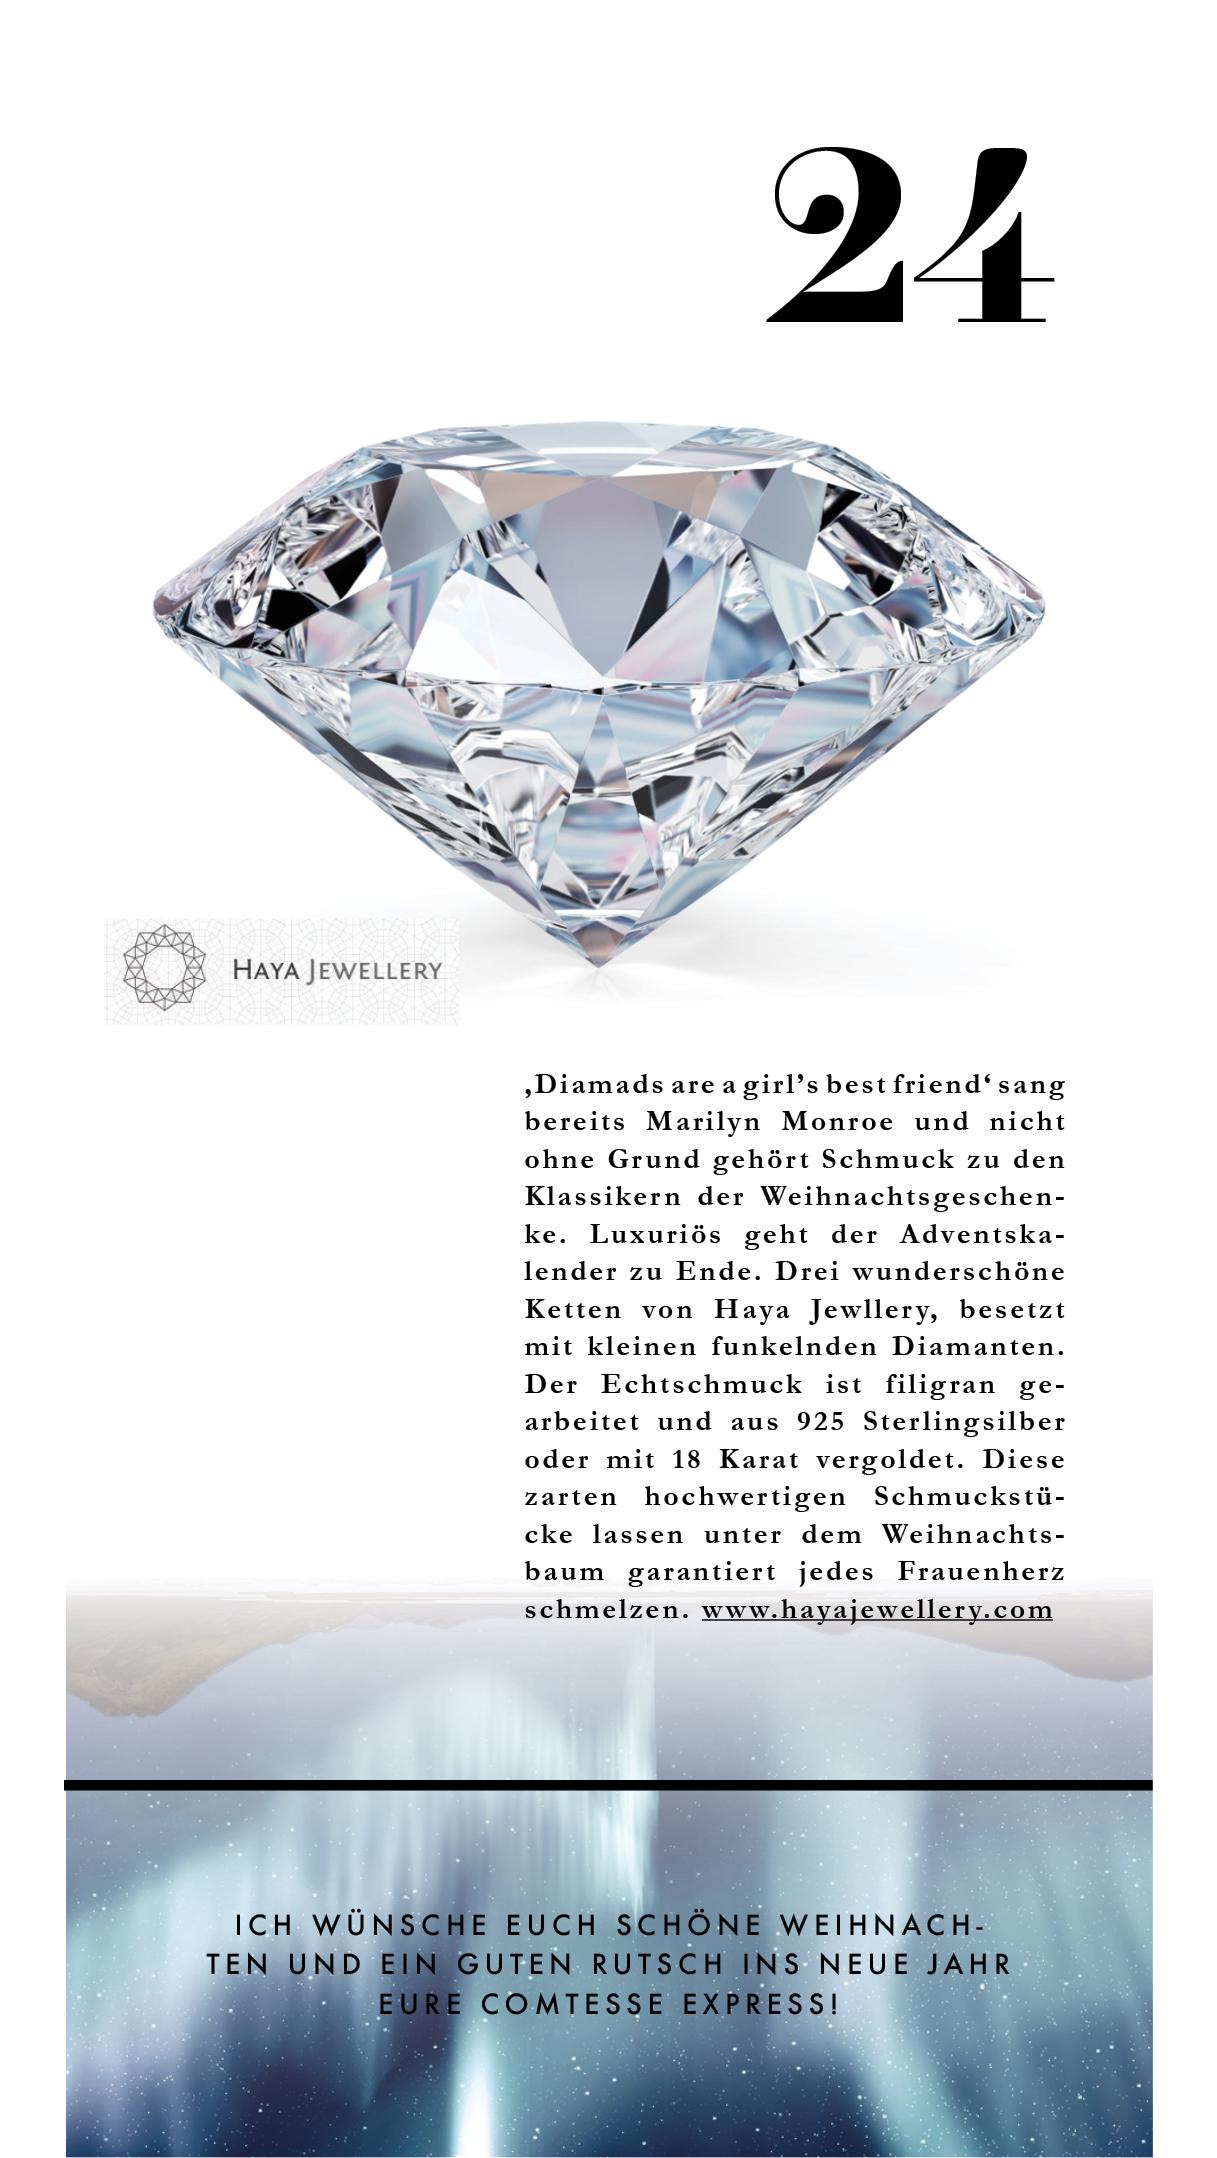 Diamenten von Haya Jewellery